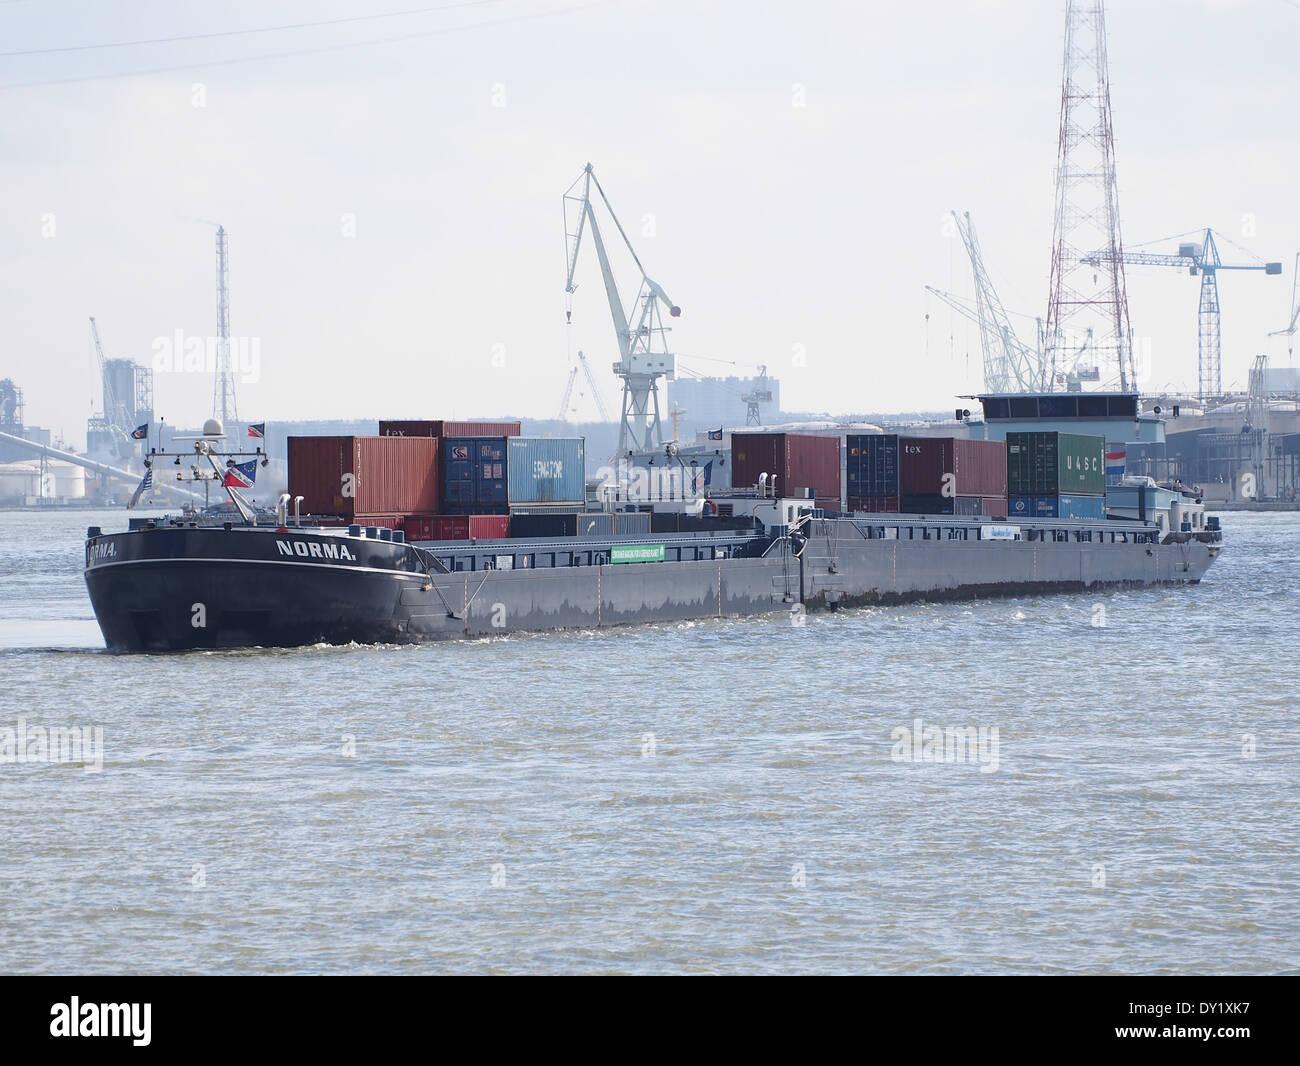 NORMA ENI 02328681 & NORMA II ENI 02329245 at Port of Antwerp - Stock Image